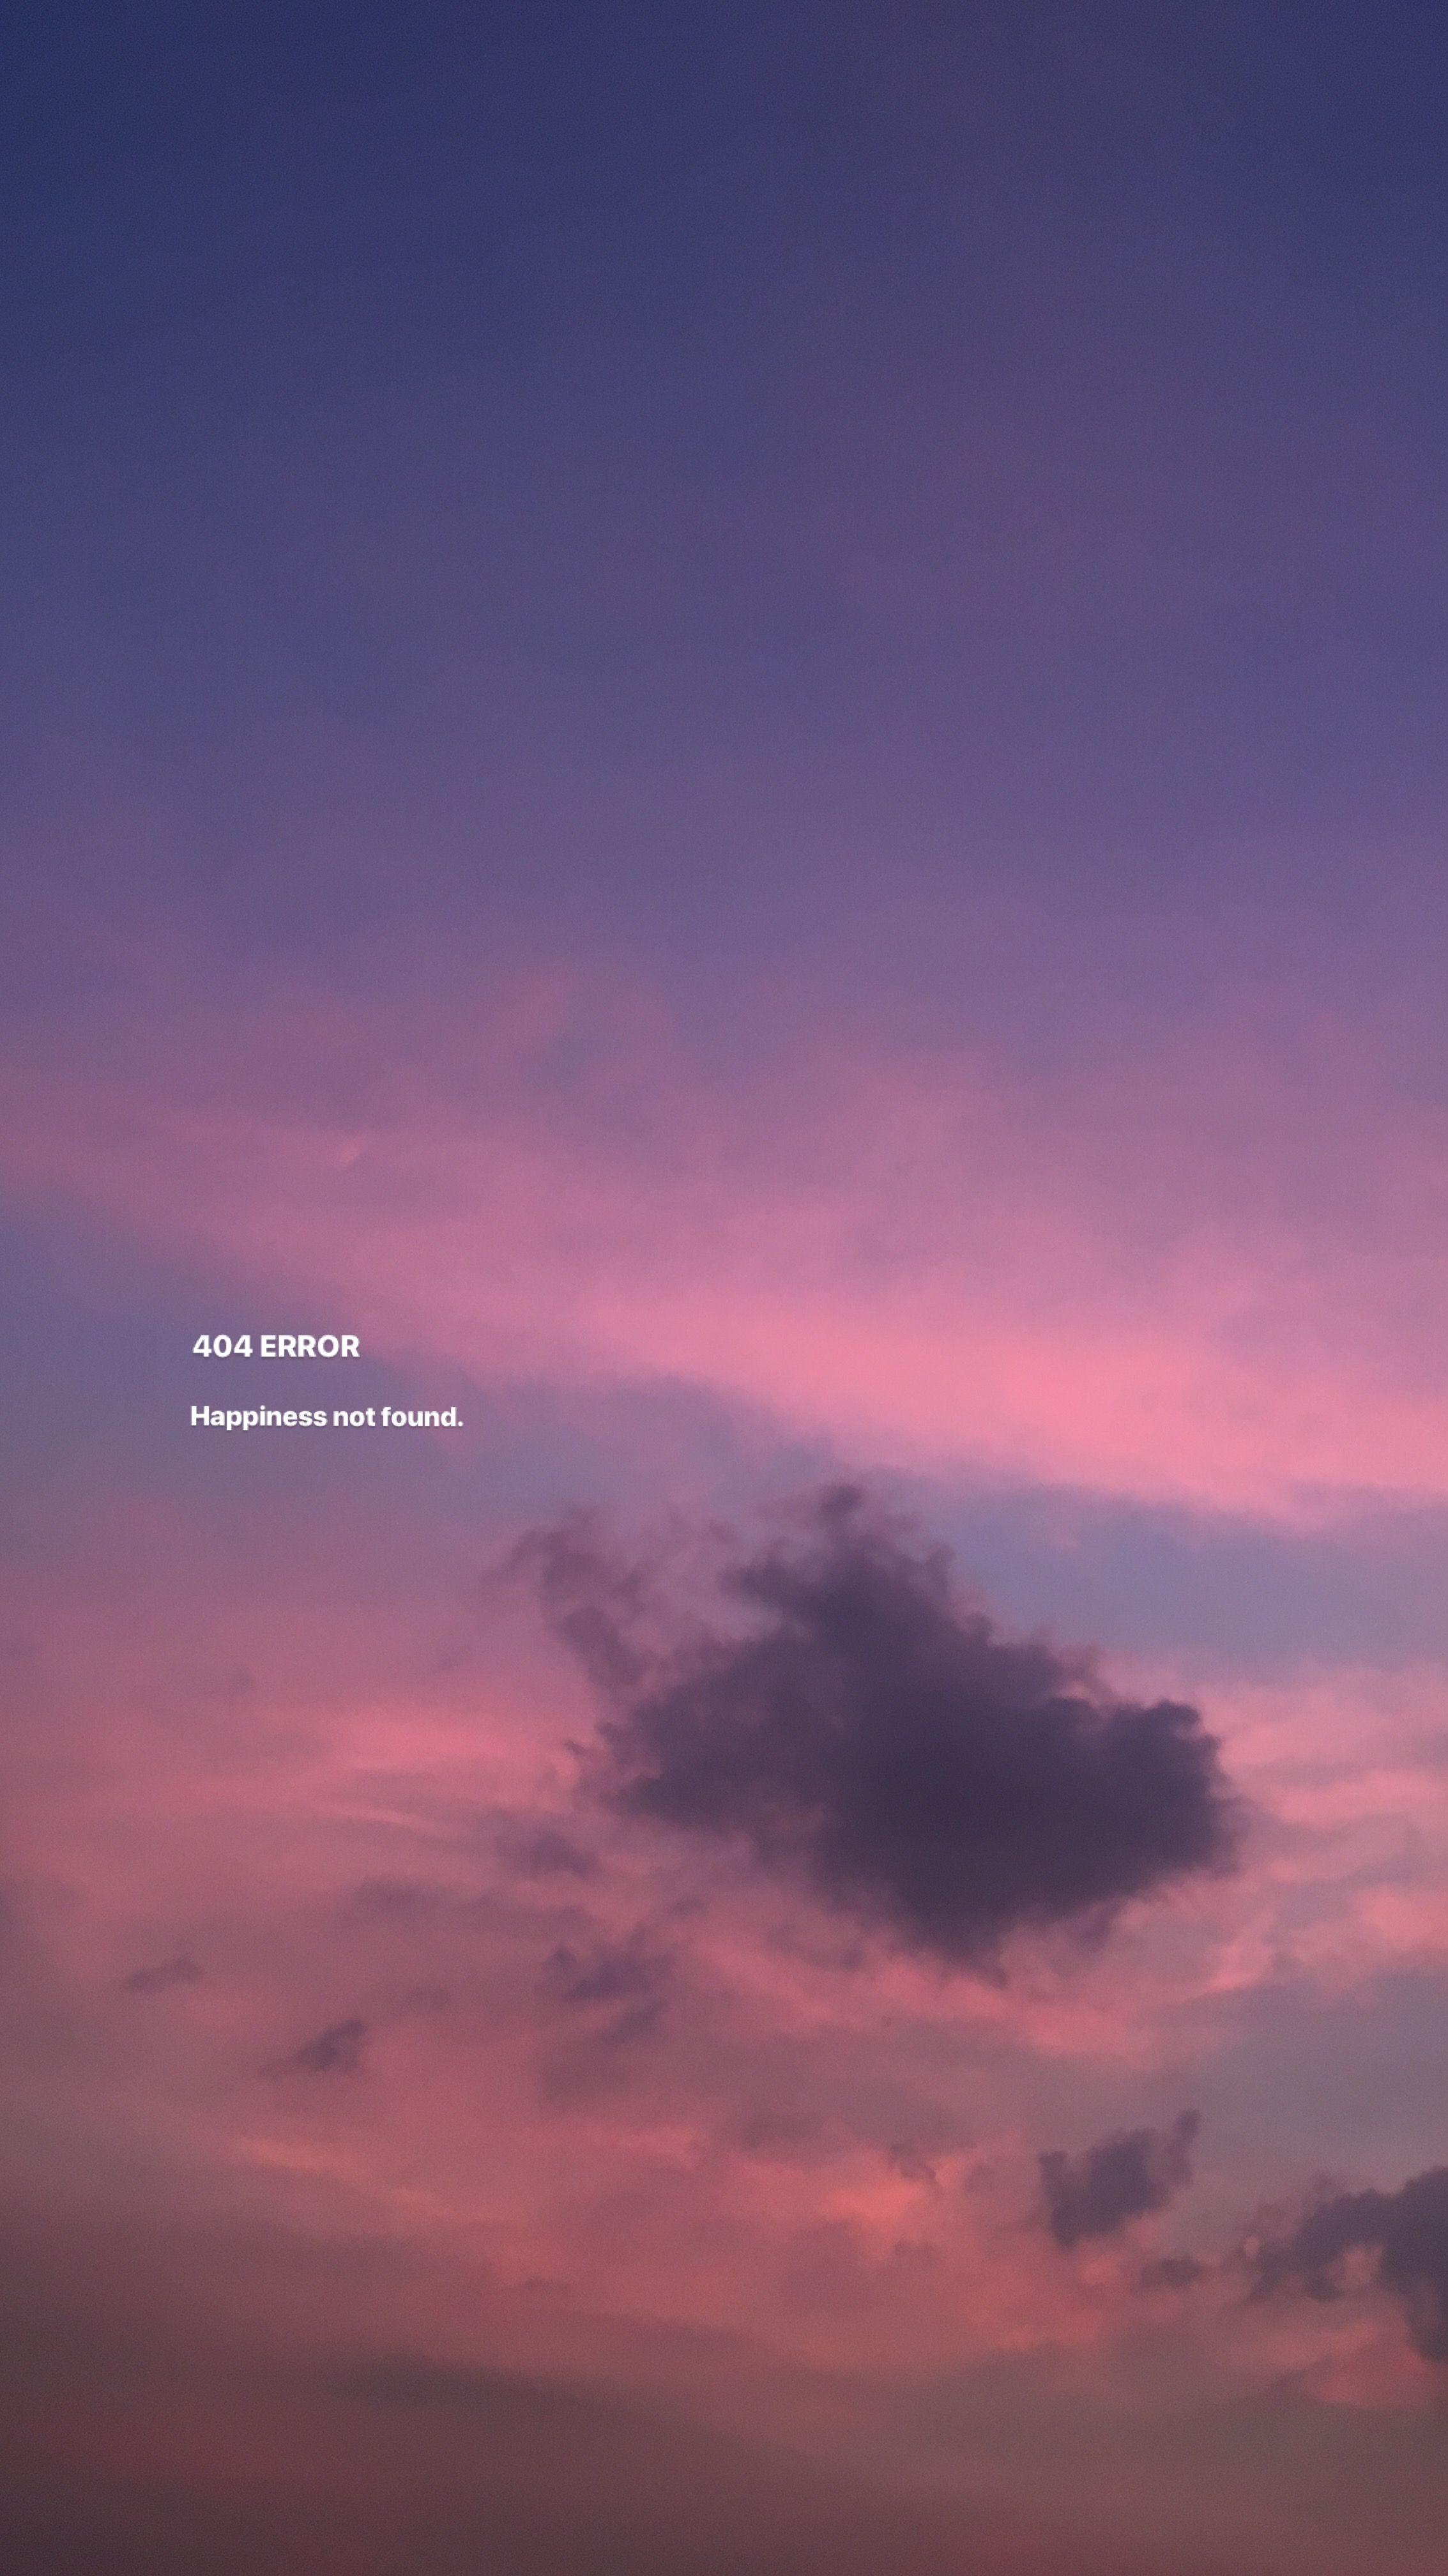 Citate Fotografie Eveniment : Pin adăugat de nguyễn thiên băng hàn pe aethestetic purple